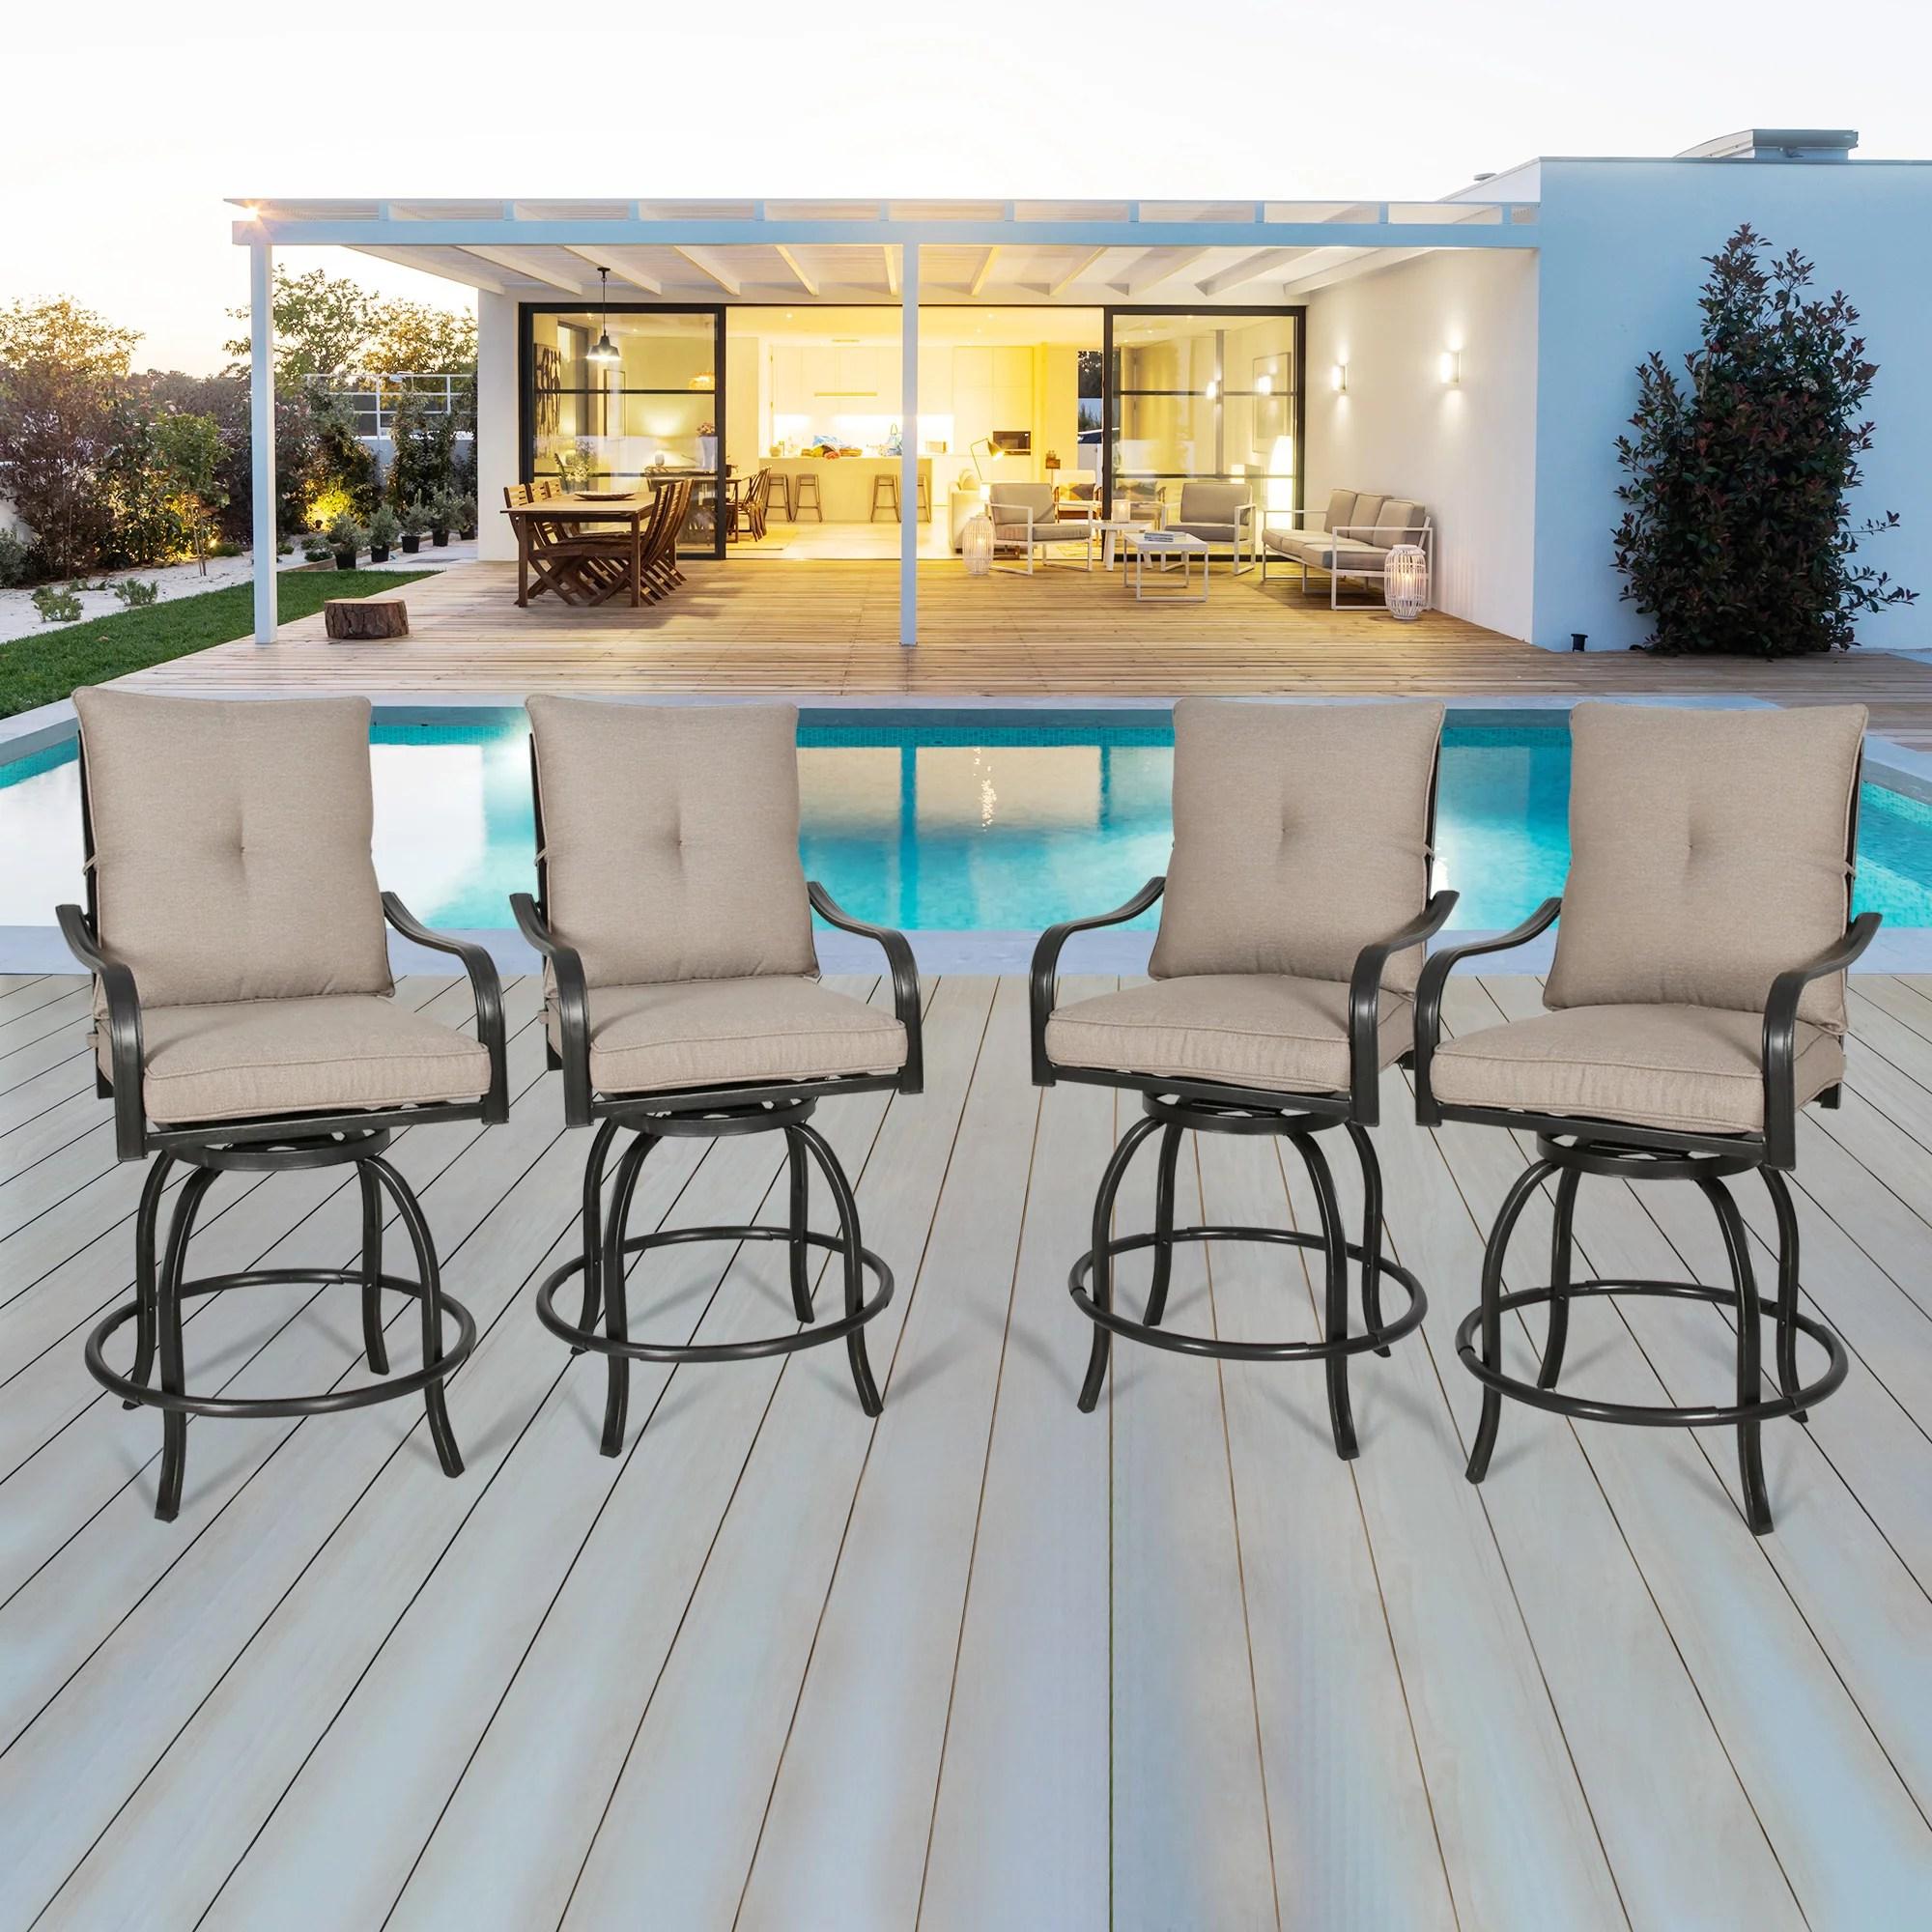 ulax furniture outdoor 4 piece counter height swivel bar stools high patio dining chair set walmart com